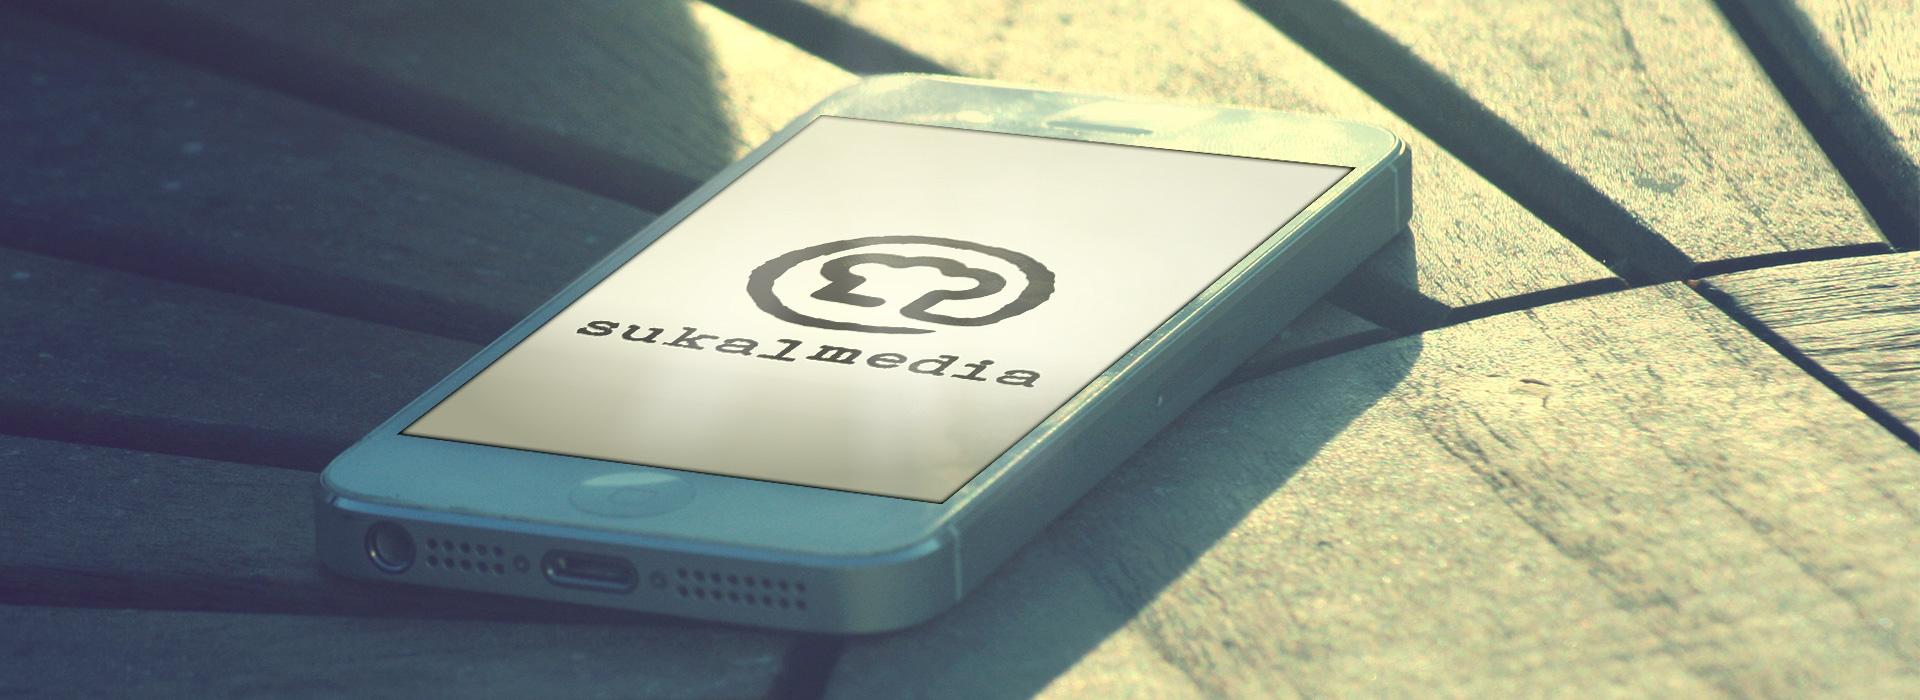 Sukalmedia | Agencia de Comunicación Creativa y Social Media Marketing de Bilbao